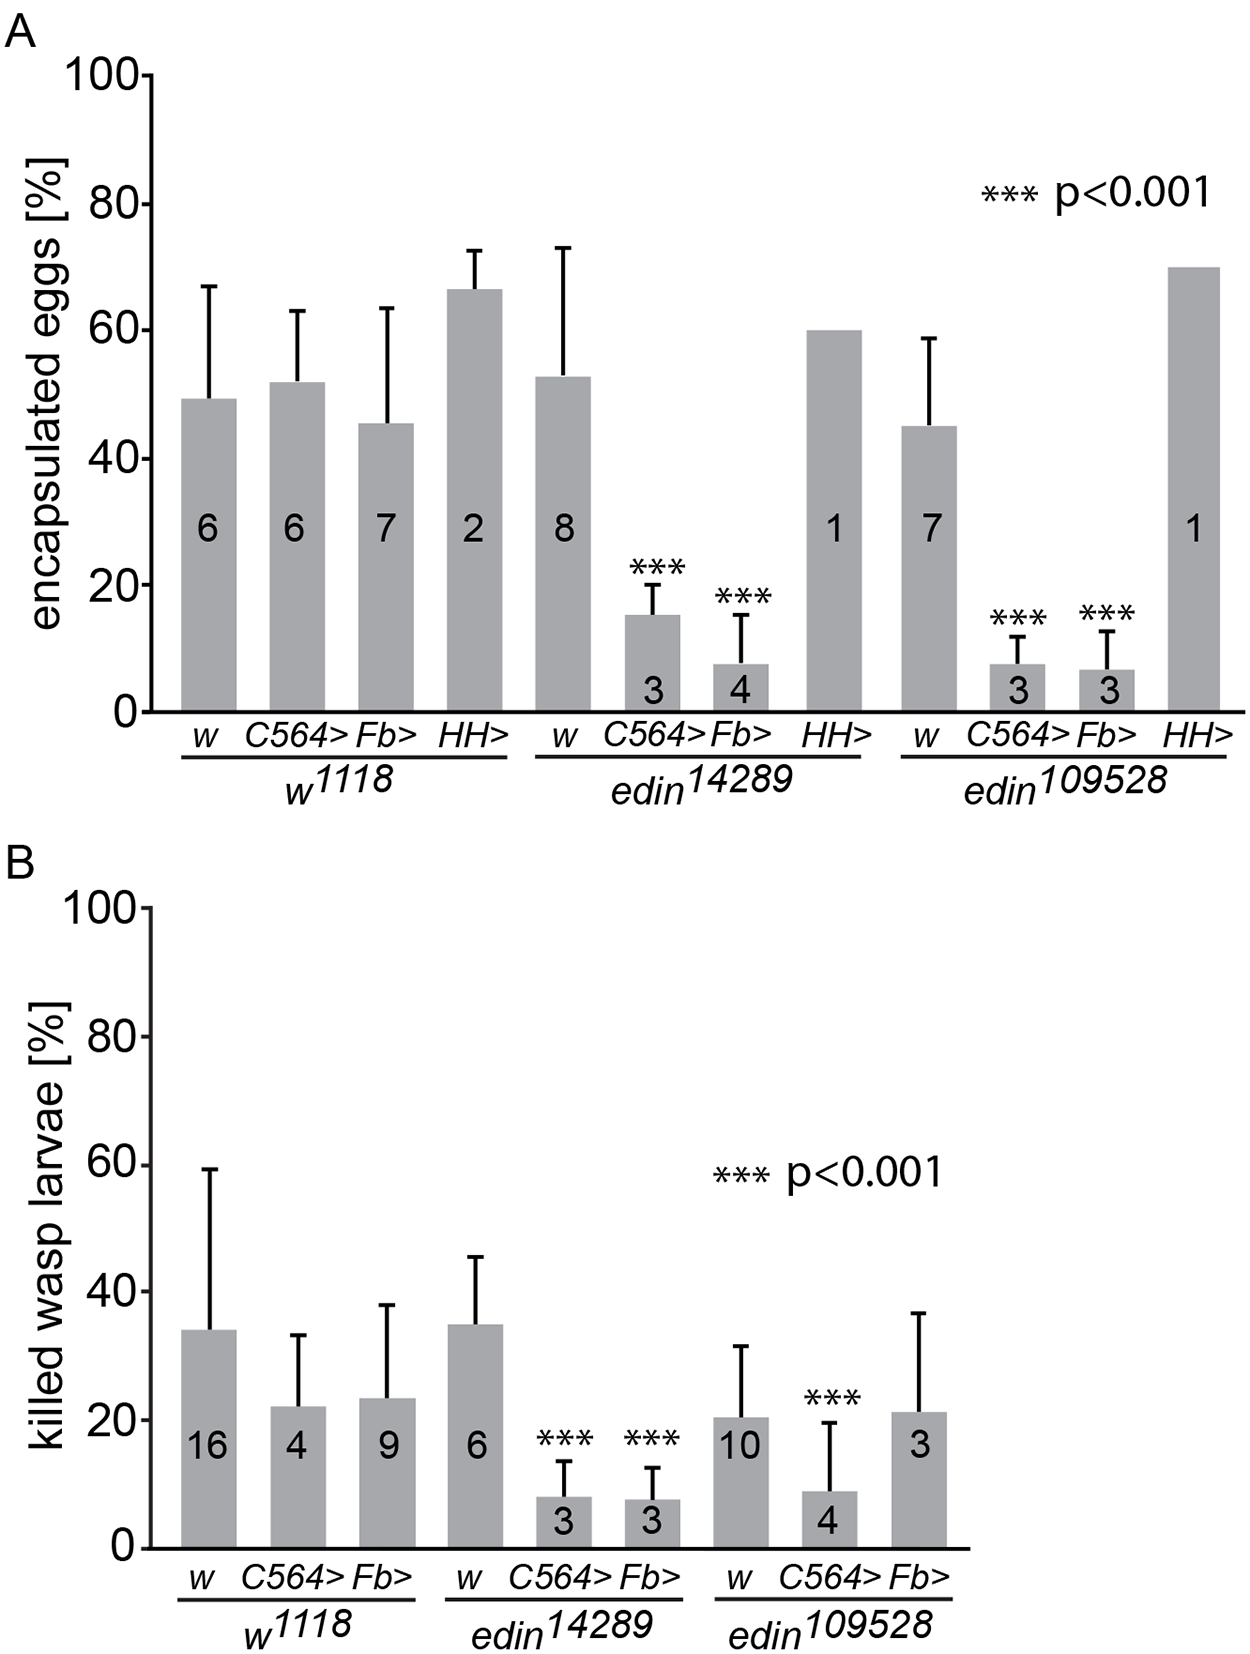 Knock down of <i>edin</i> in the fat body decreases the encapsulation and killing ability of <i>Drosophila</i> larvae.